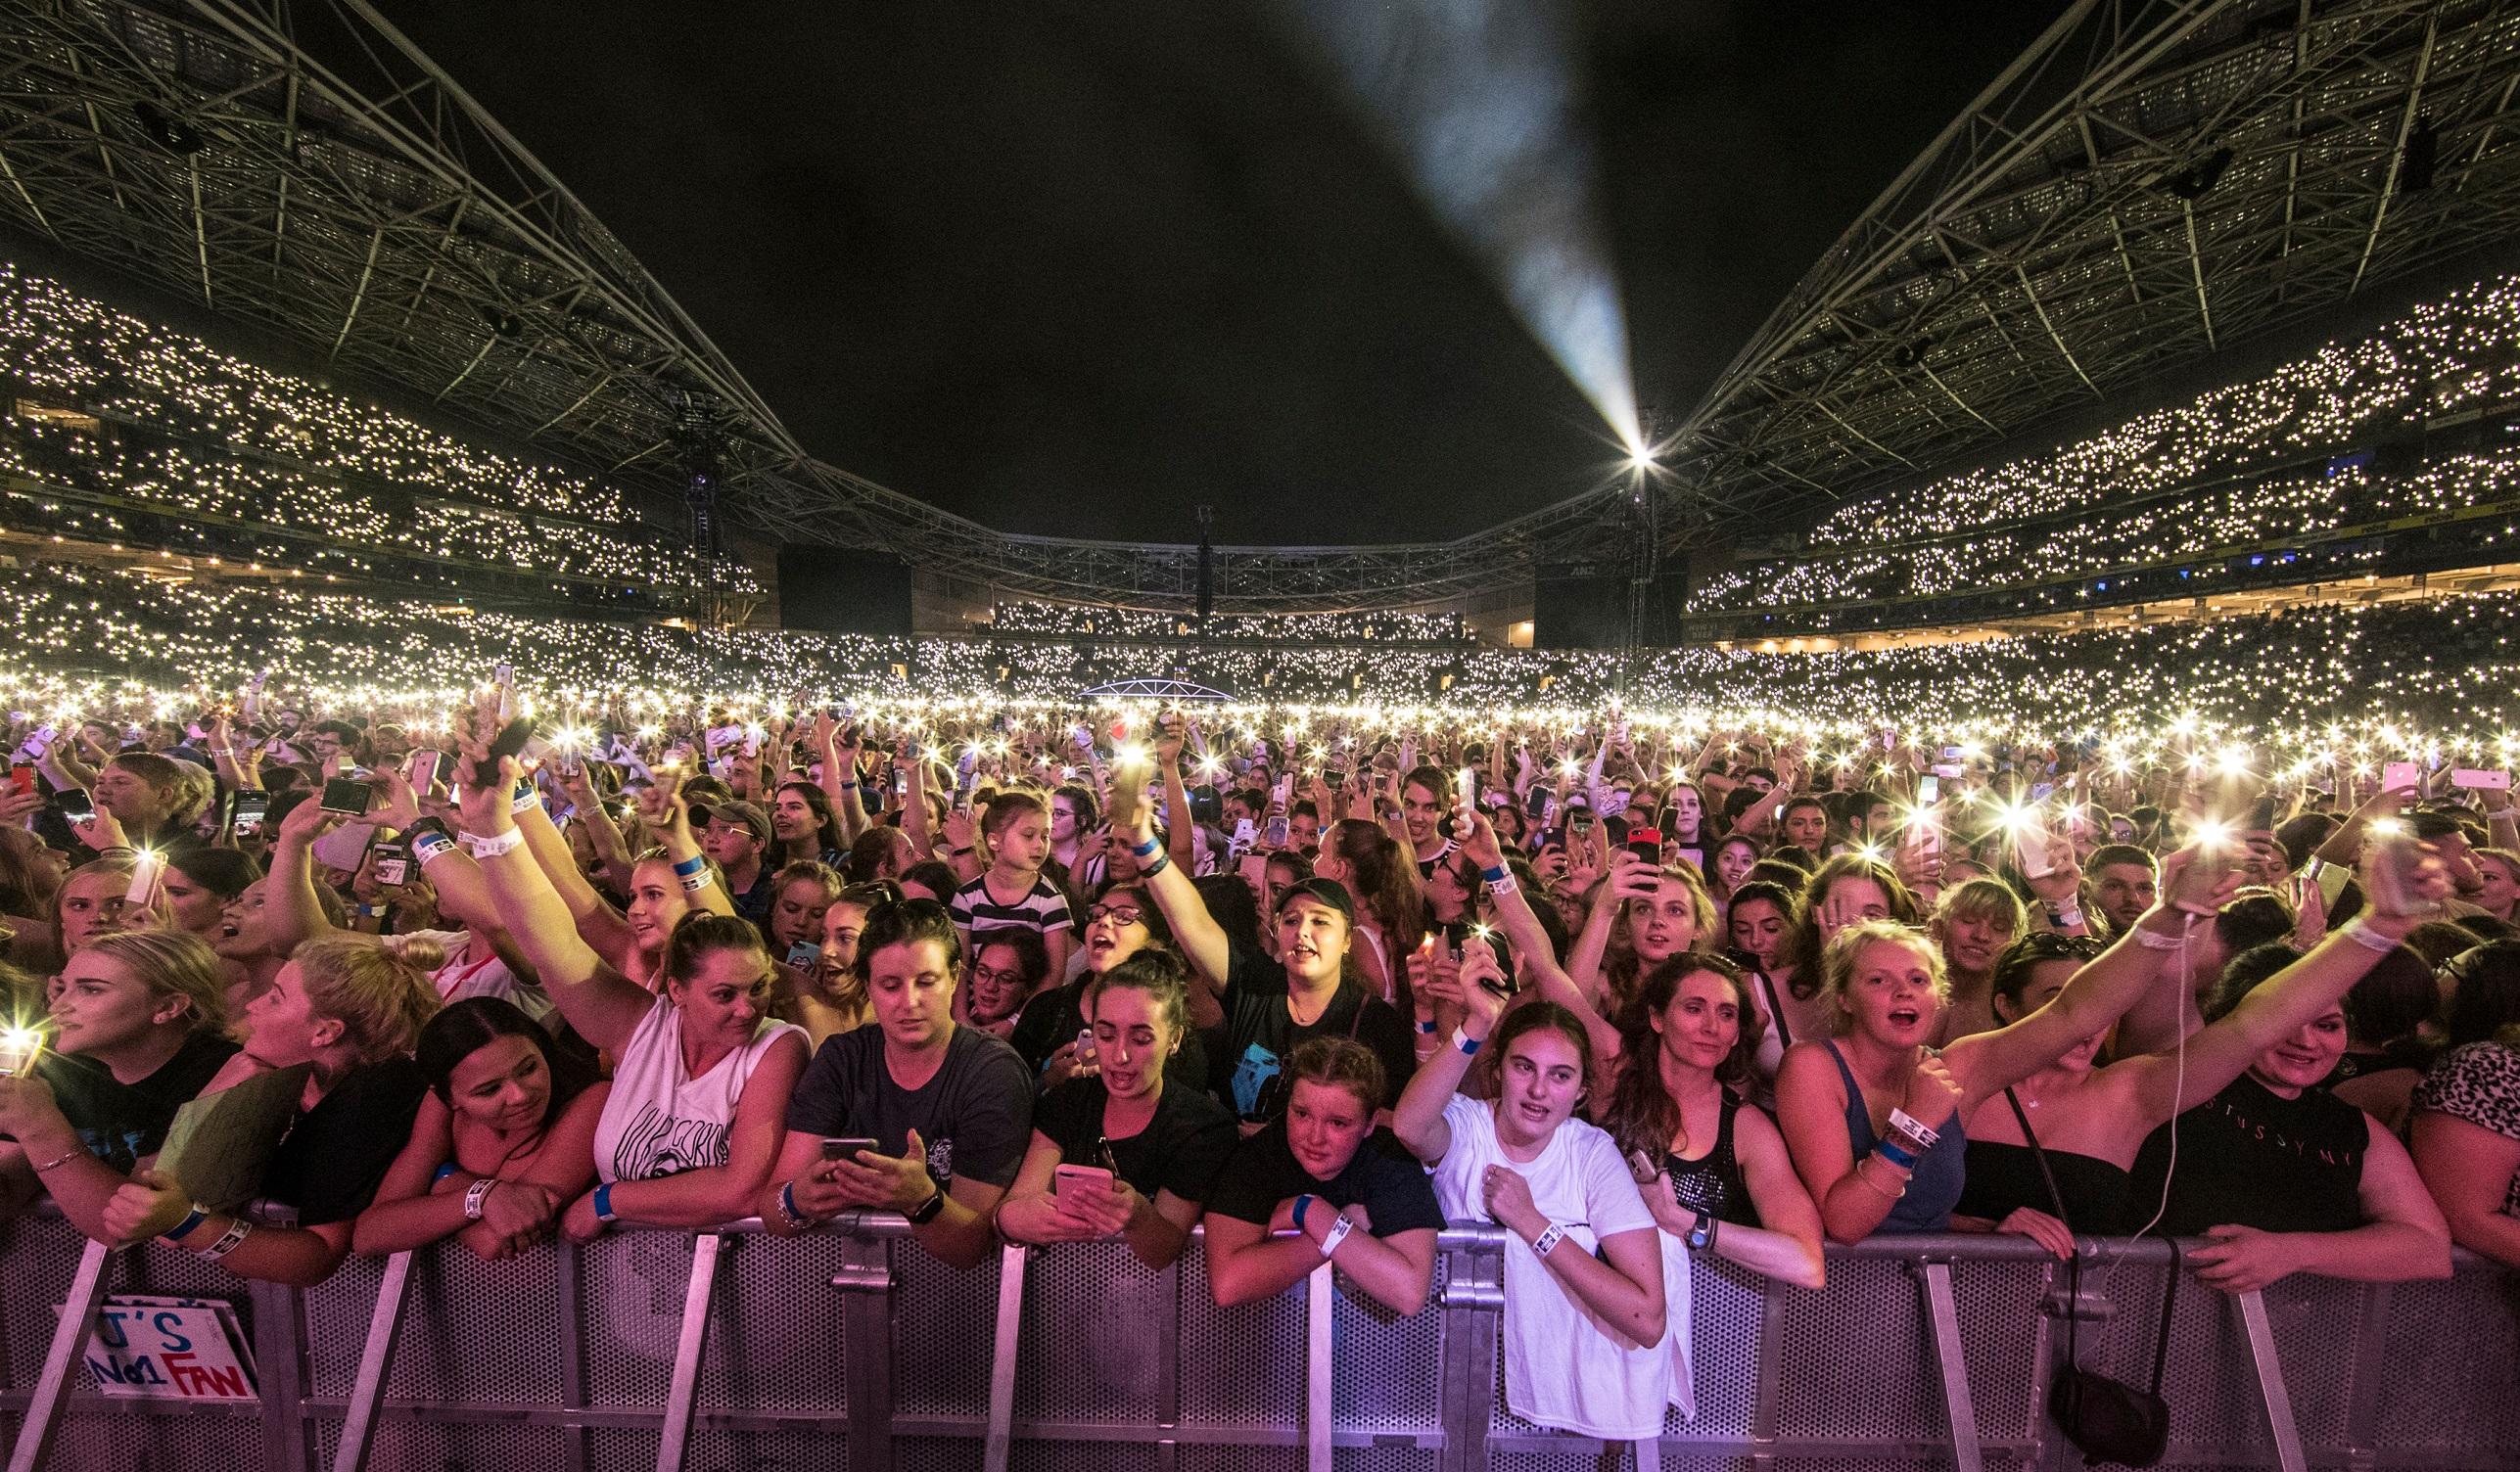 Ed Sheeran Crowd.jpg